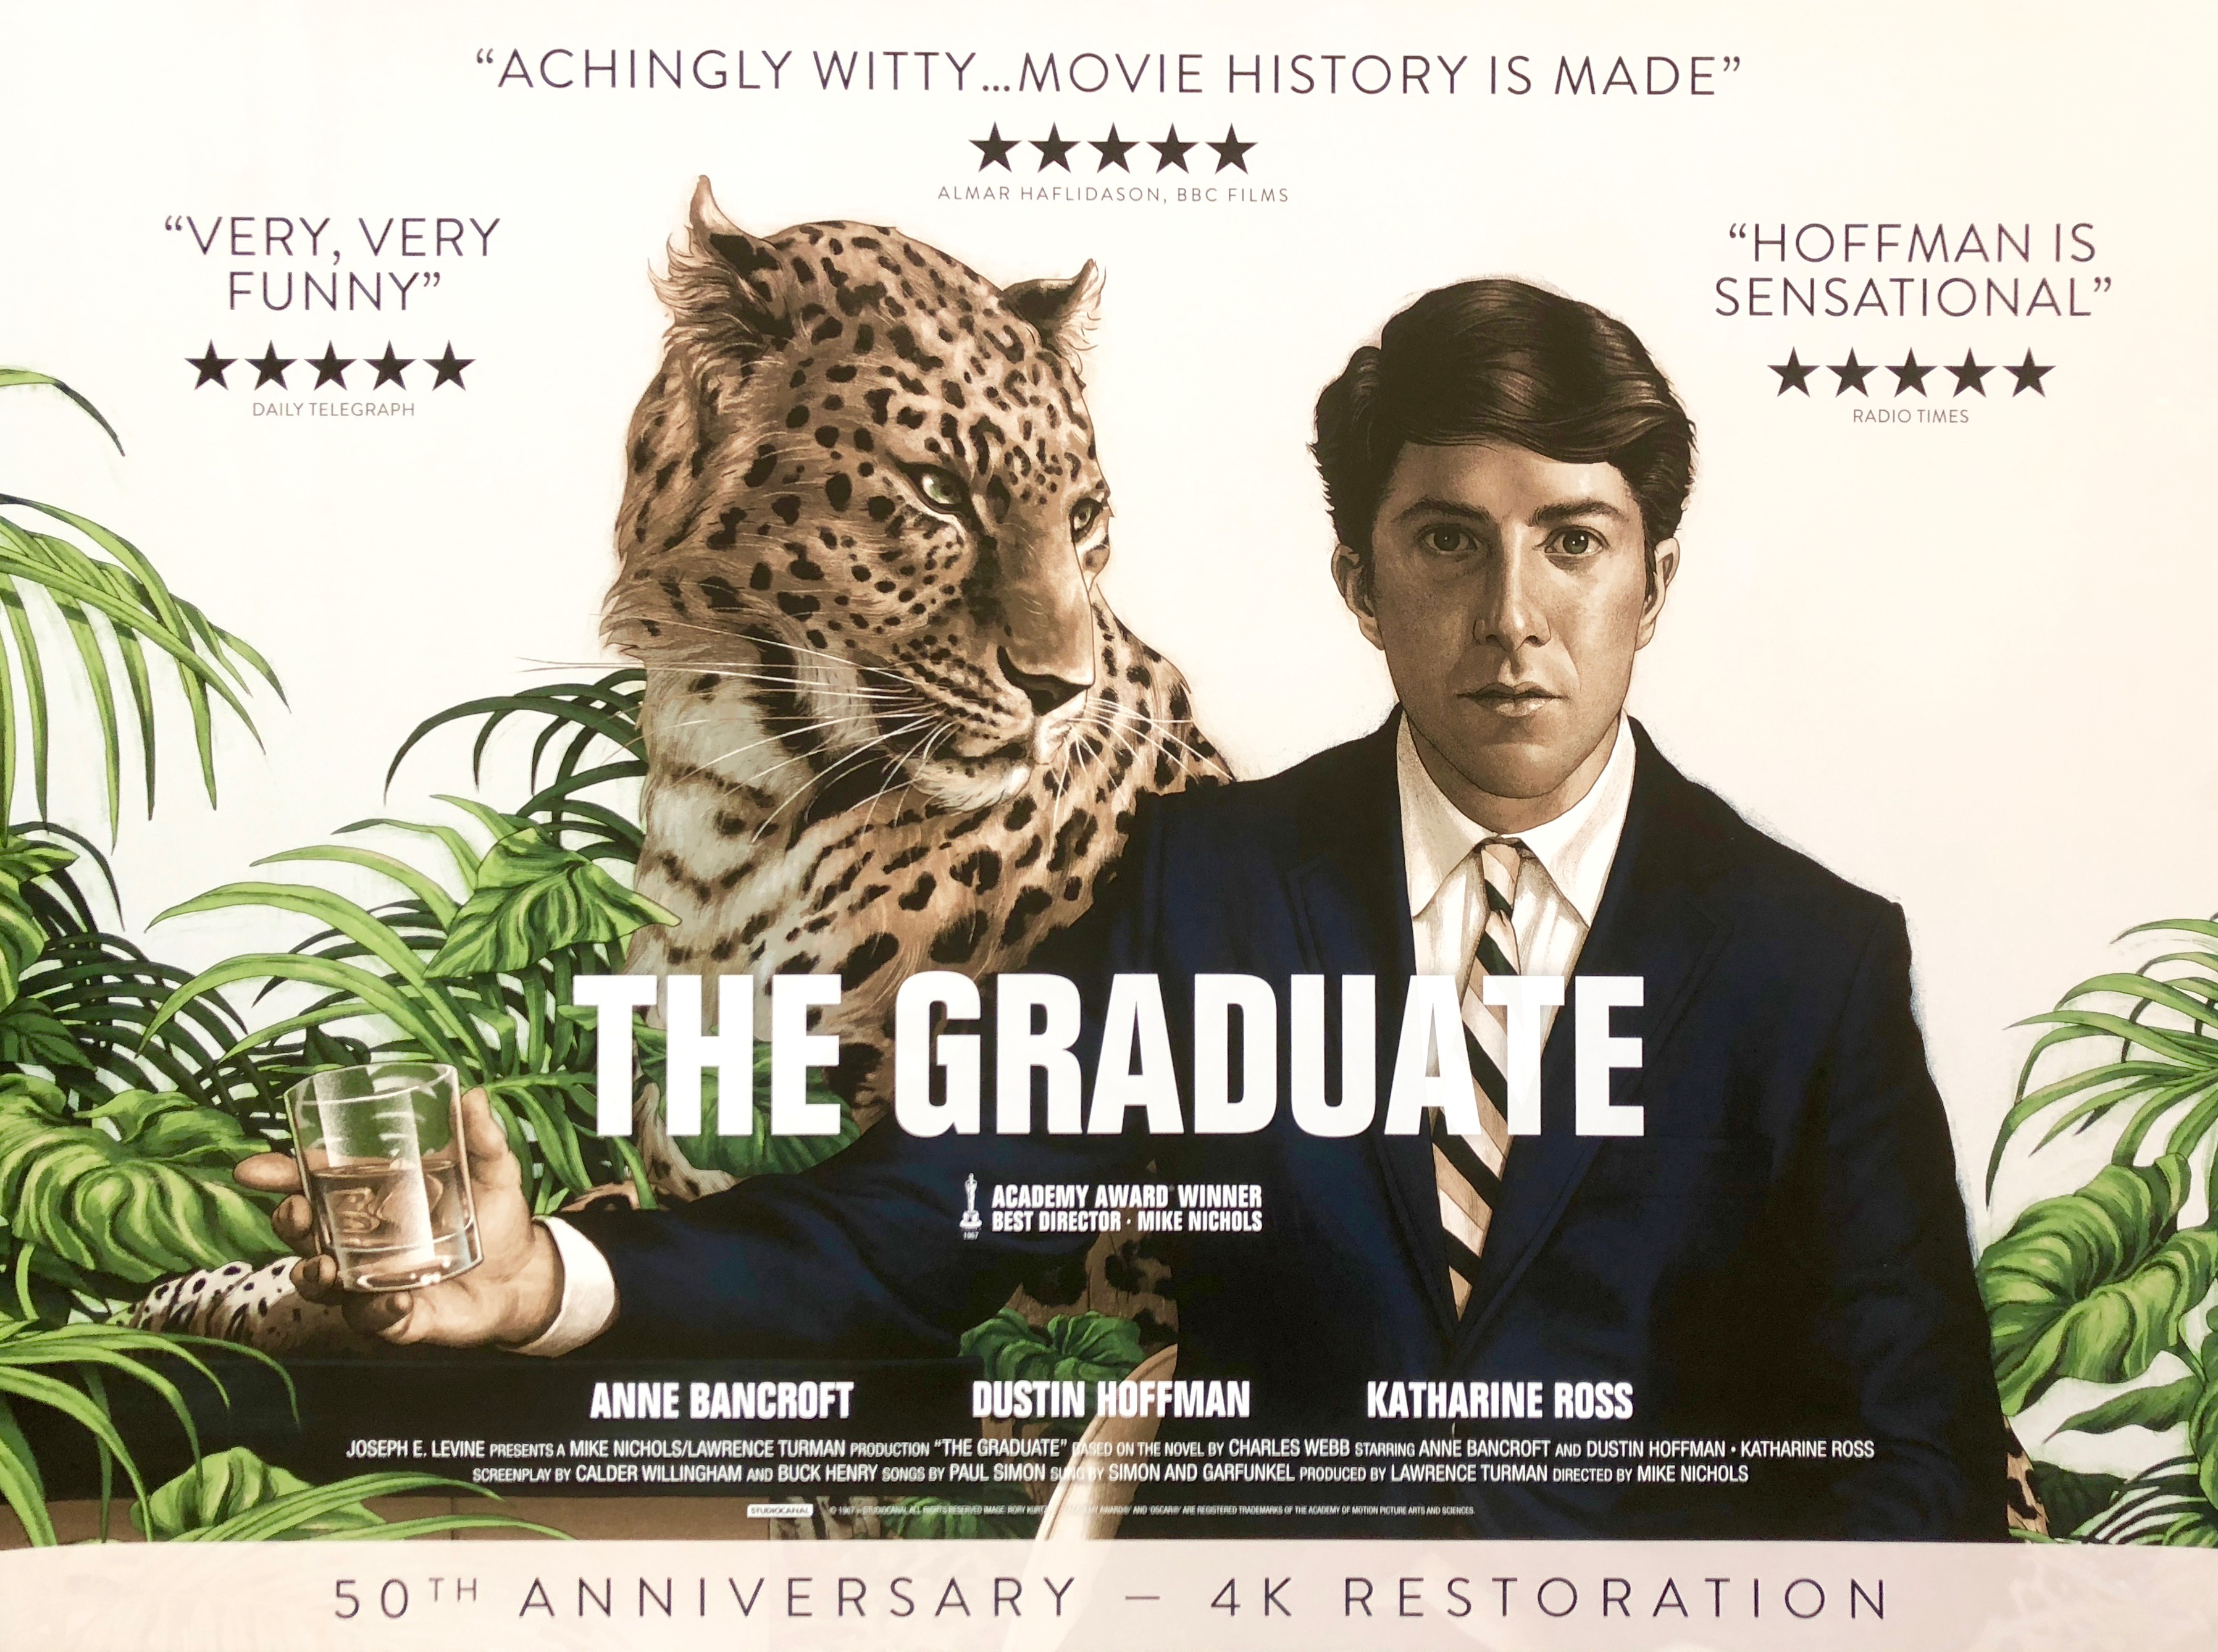 The-Graduate-Movie-Poster